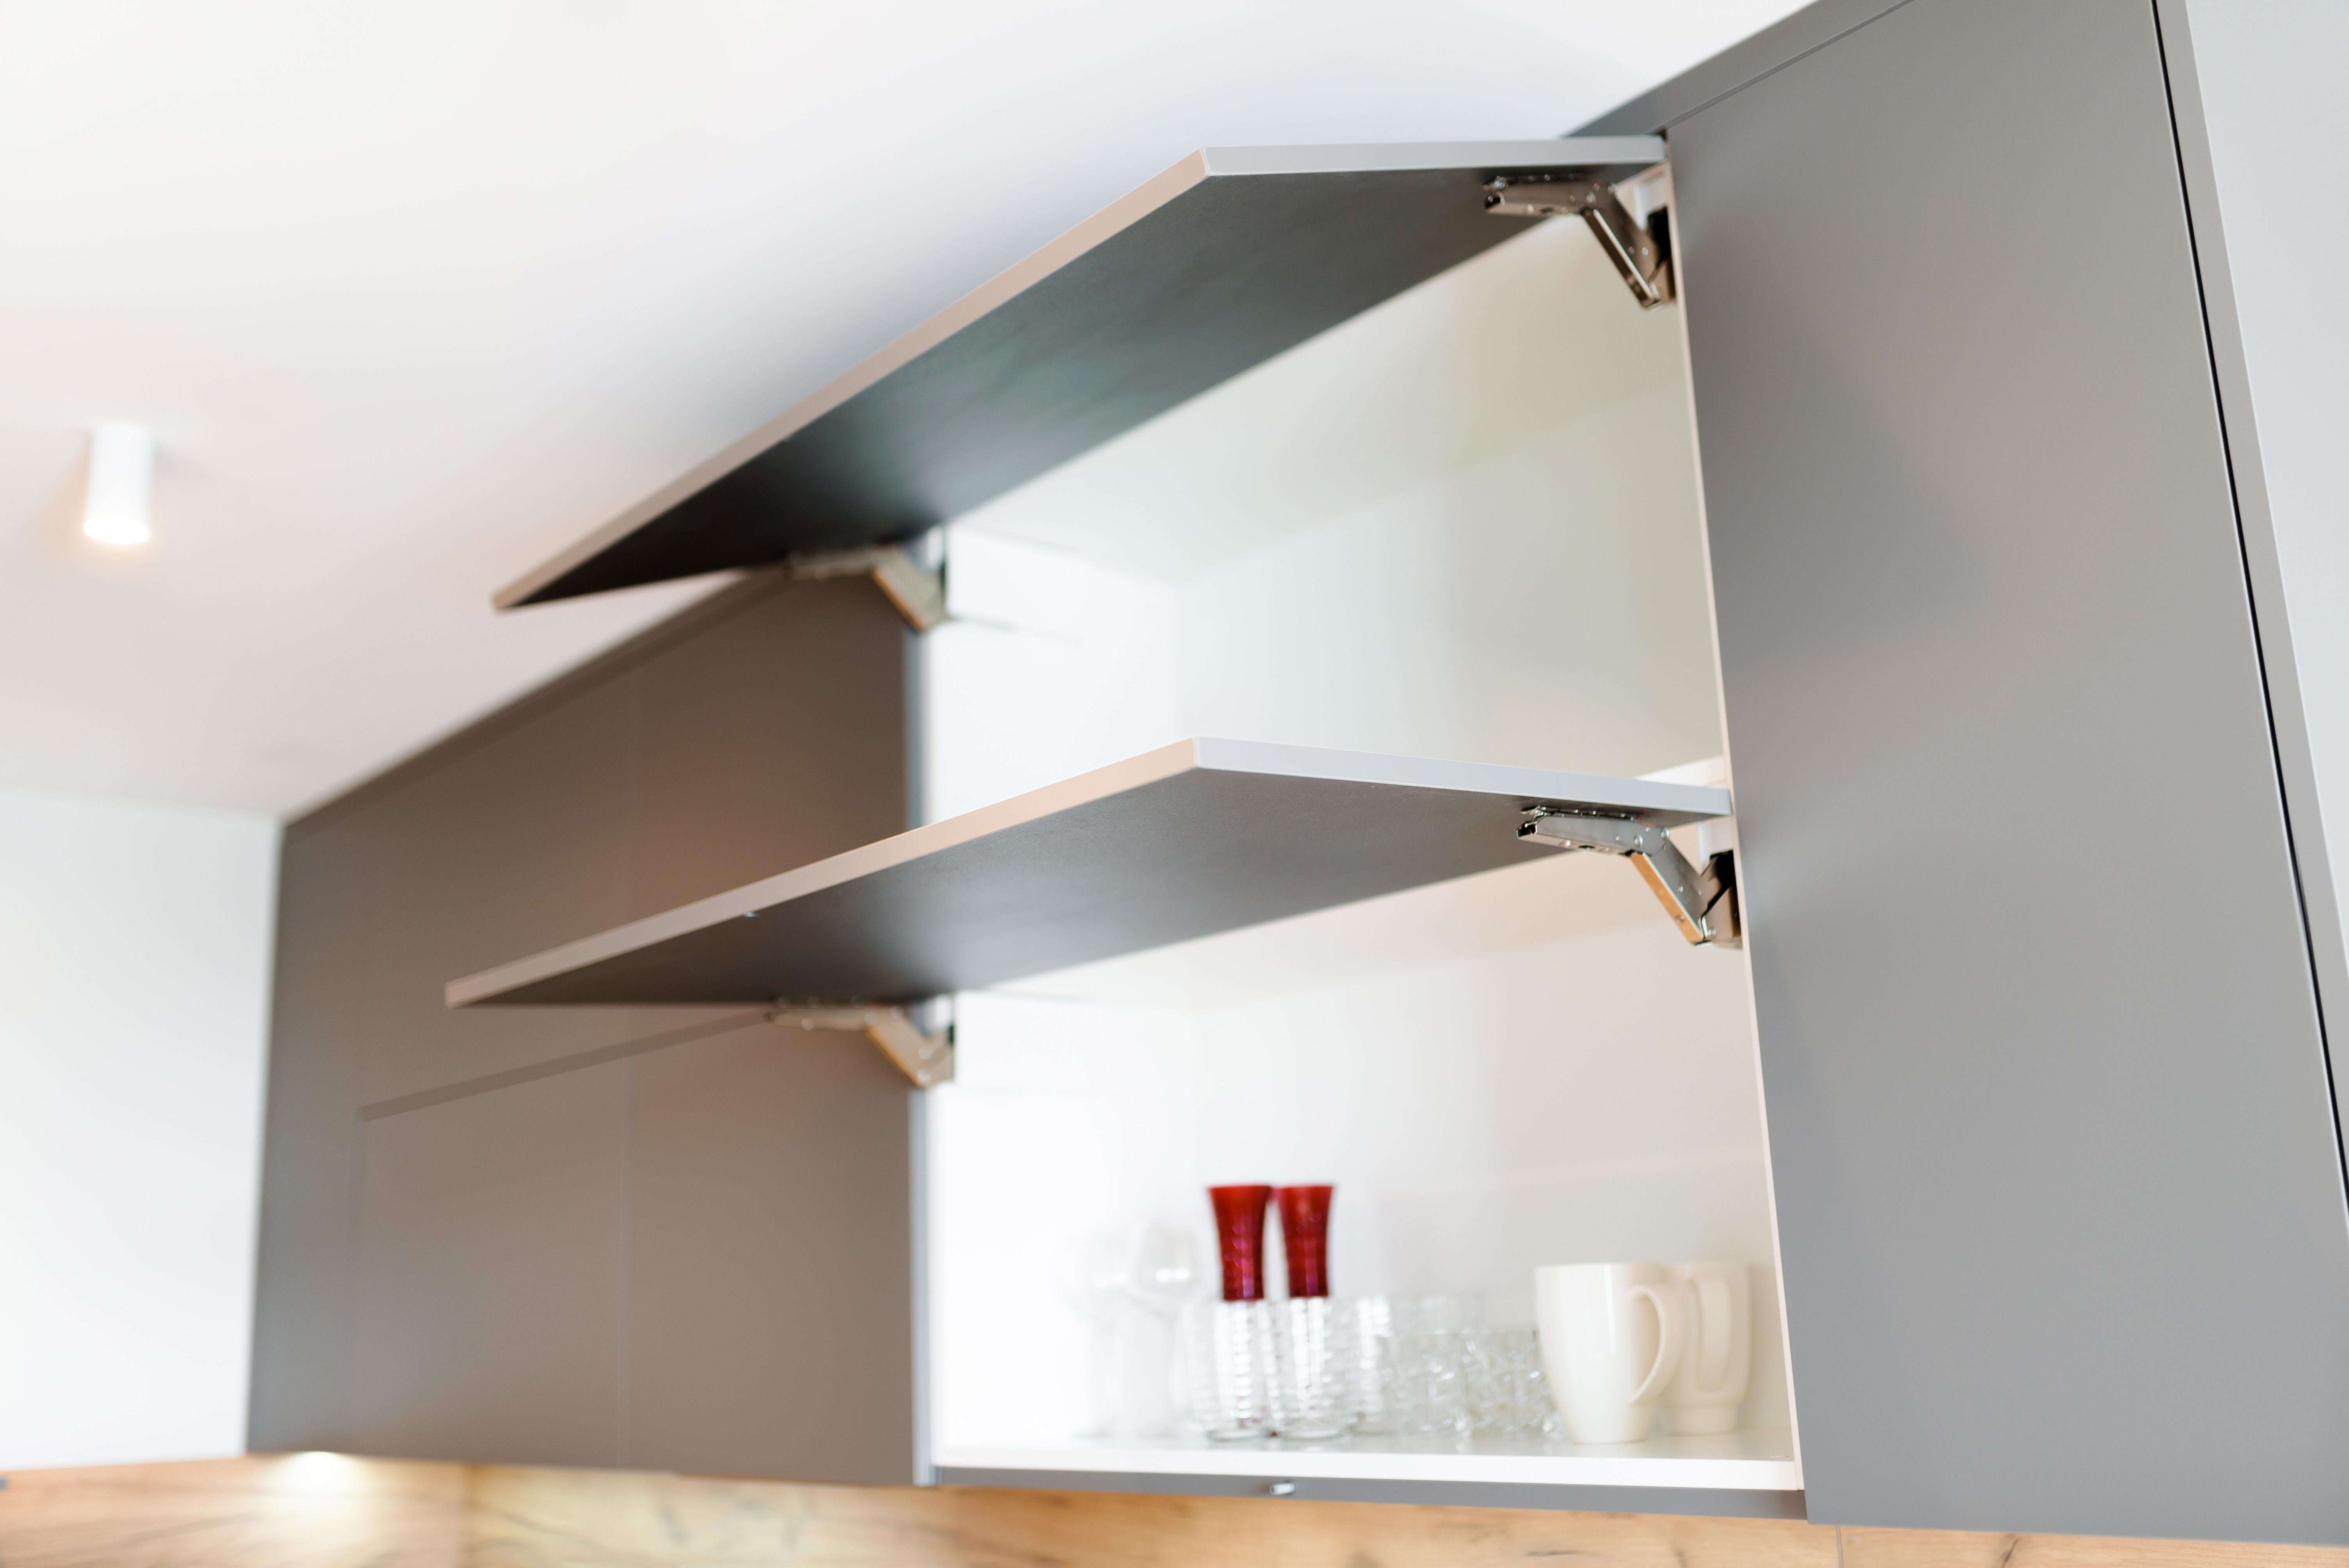 Blum Aventos mēbeļu furnitūra | Albero Mēbeles